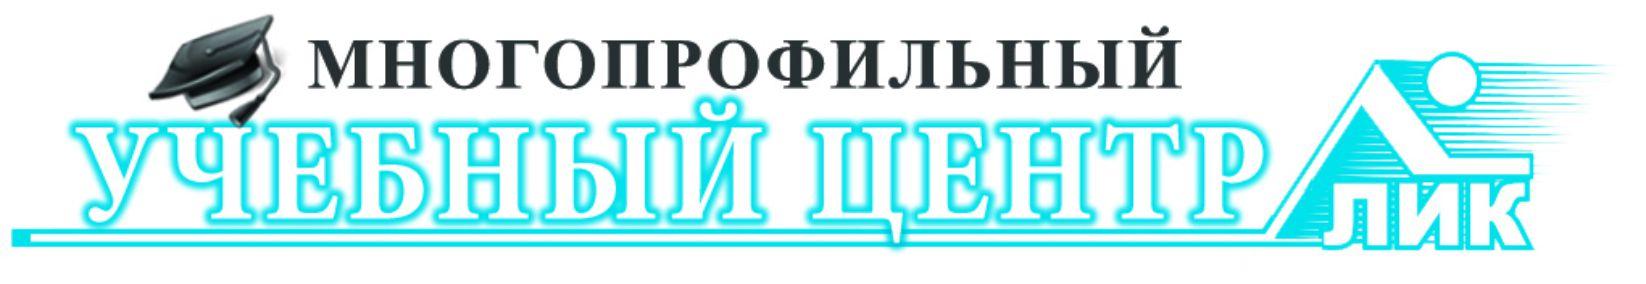 https://proxy.imgsmail.ru/?email=red-rst%40mail.ru&e=1564954590&h=poYy5N3aRSDen8UDKWmbgg&url171=aW1nLmVtbGFsbC5jb20vcnUvdXNlcl9maWxlP3Jlc291cmNlPWhpbWcmdXNlcl9pZD0xMTA0OTQ4Jm5hbWU9NnFqZ2UzaGJrM2NkdWFueWVrbnhtcTZyZnF5anhkeWlkc2NtZDdwa2FveGYxcW1rcXVzM3F0anh6ZGczYXFhaWhxMXc3dW13YzVxd2picTg4dWJ0YTRleXFoeHBqc2F3anQ0aGVxd2E~&is_https=0